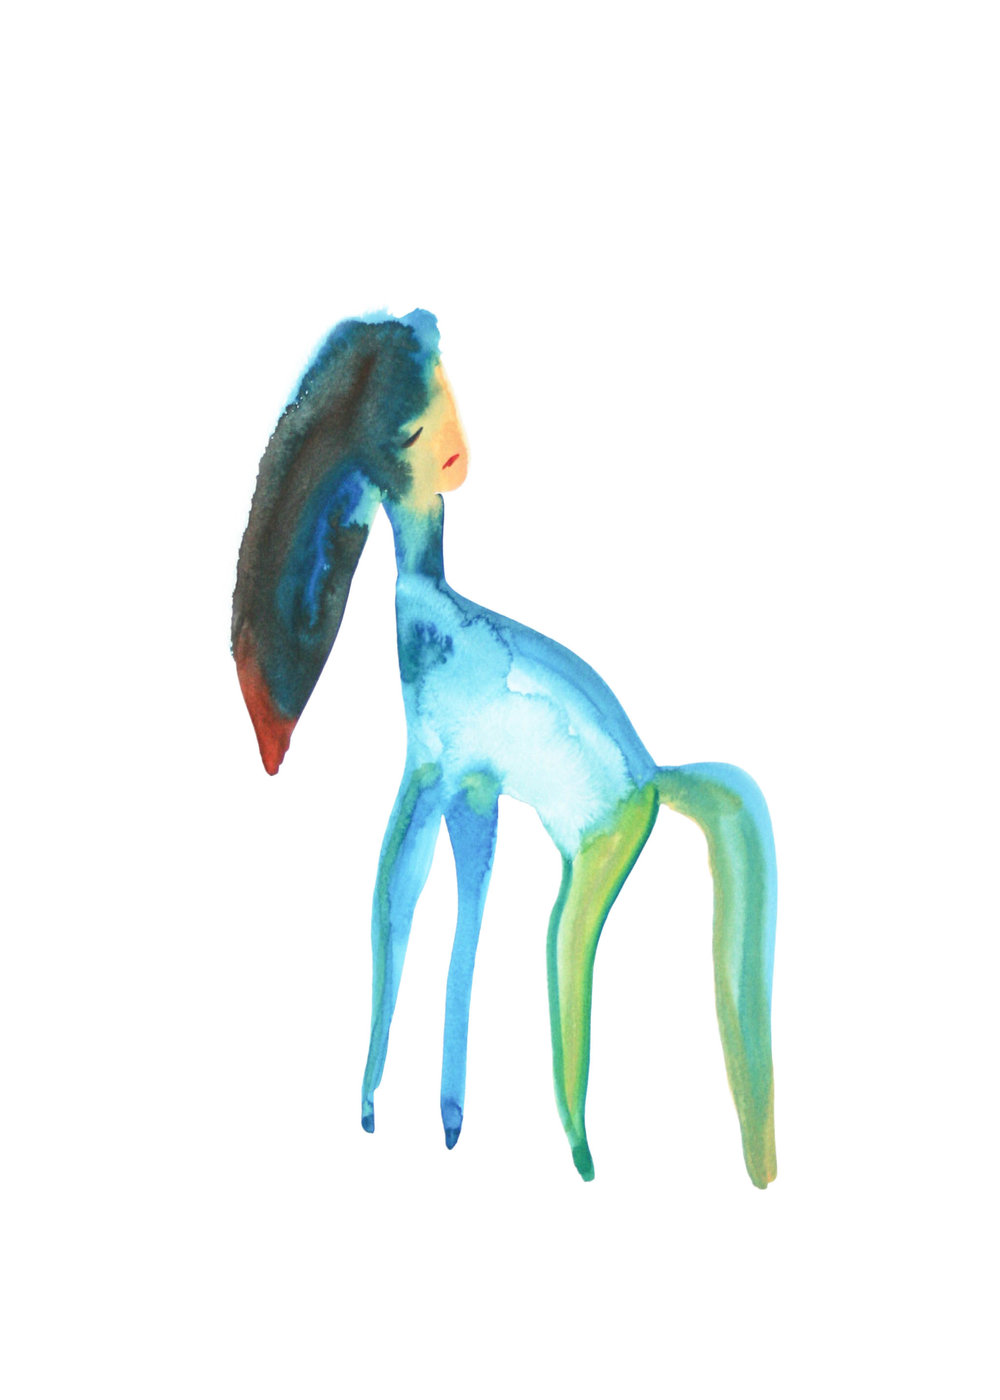 Sad animal 2  , 2014,watercolor on paper, 36x48cm